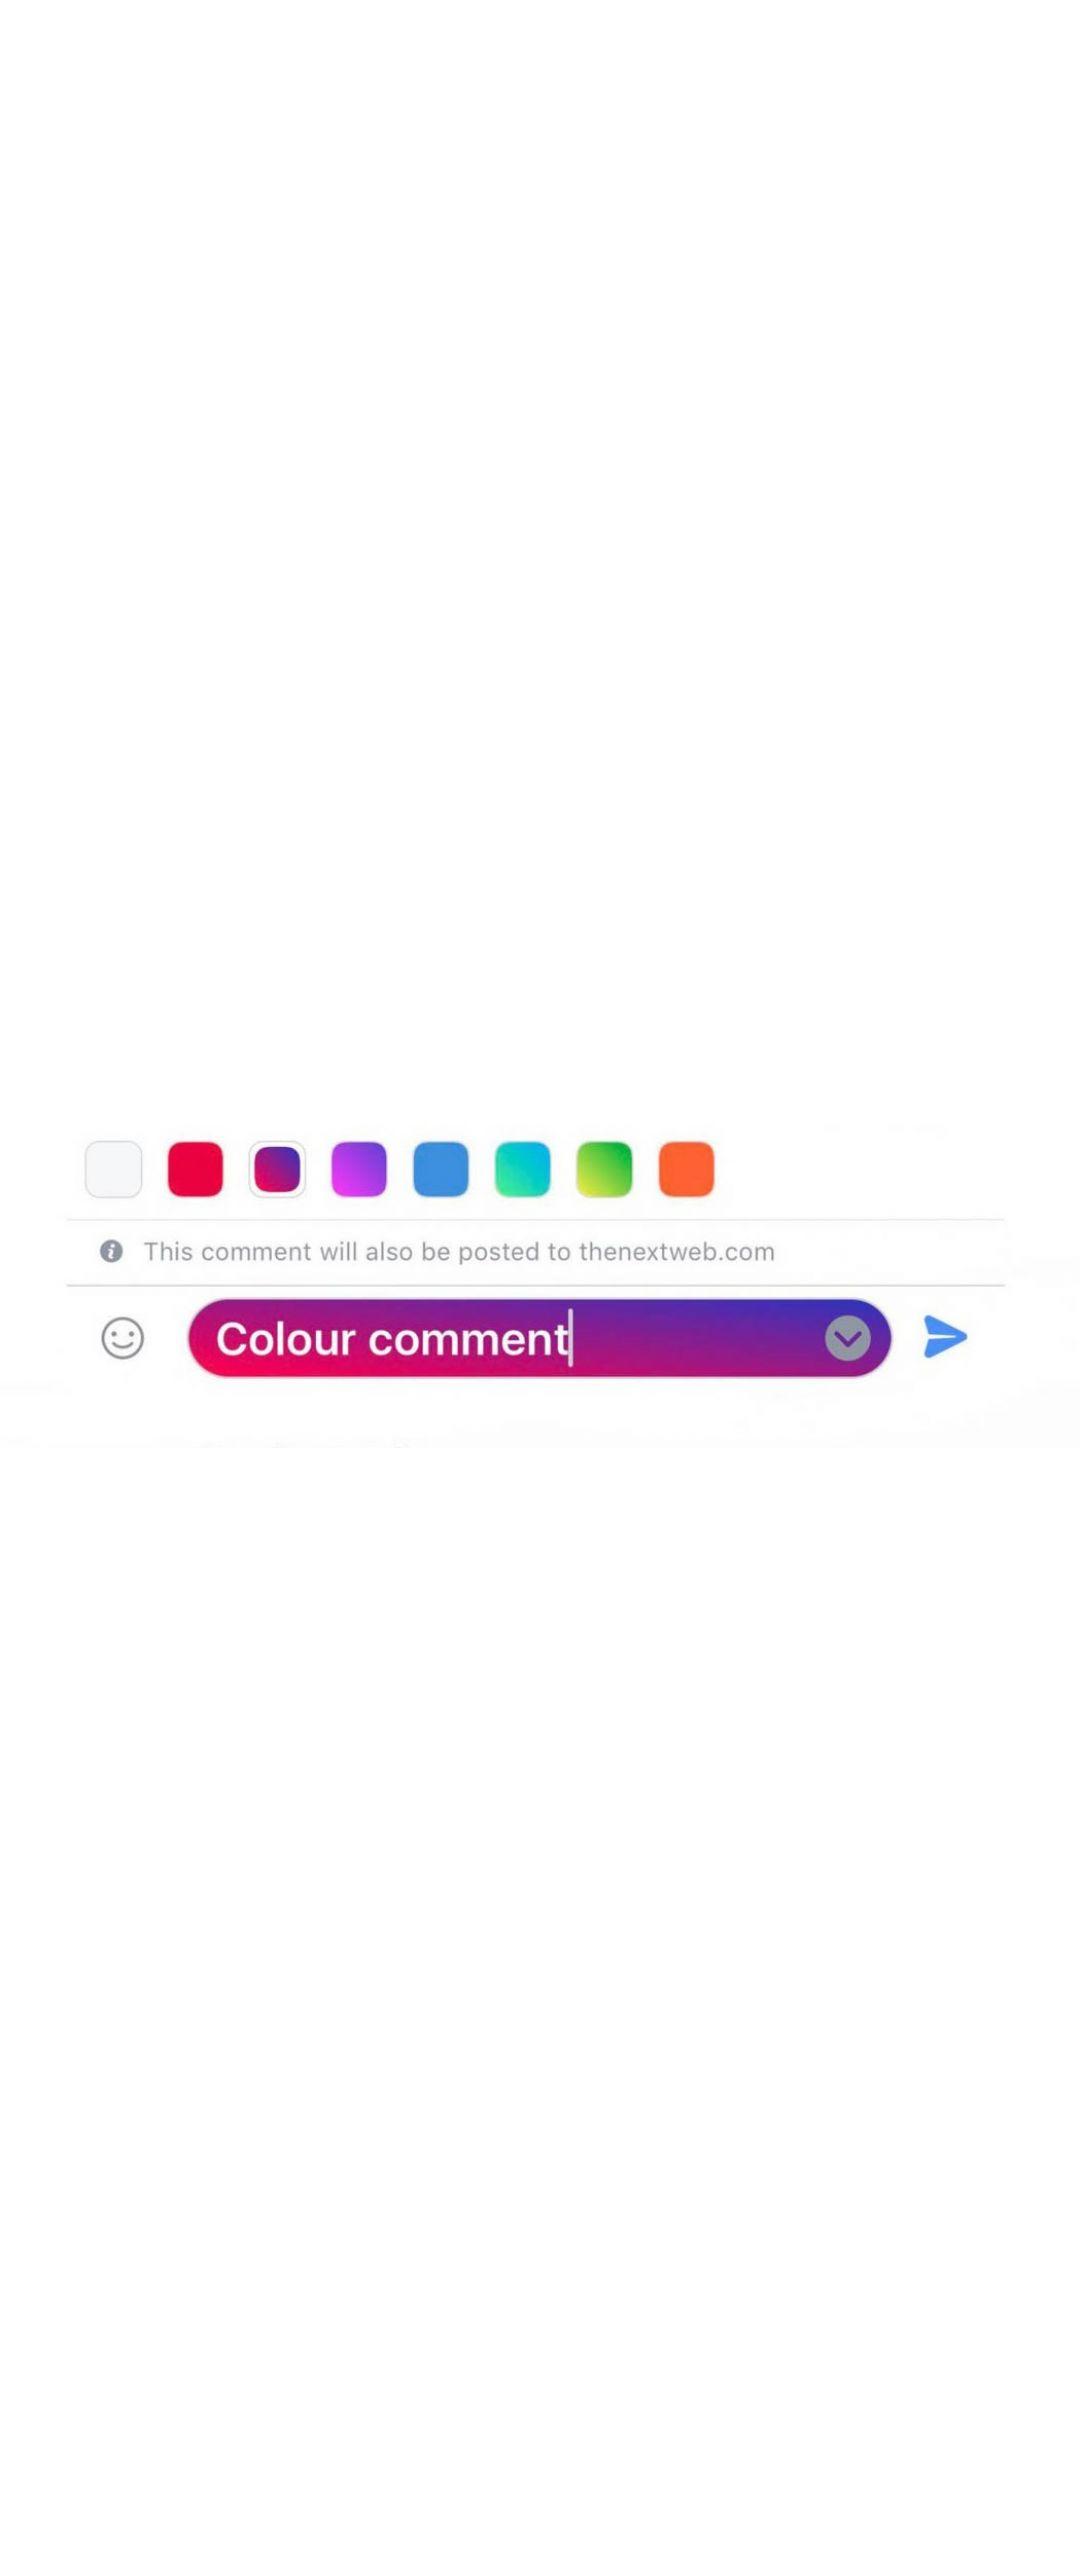 Facebook está probando comentarios coloridos en su aplicación